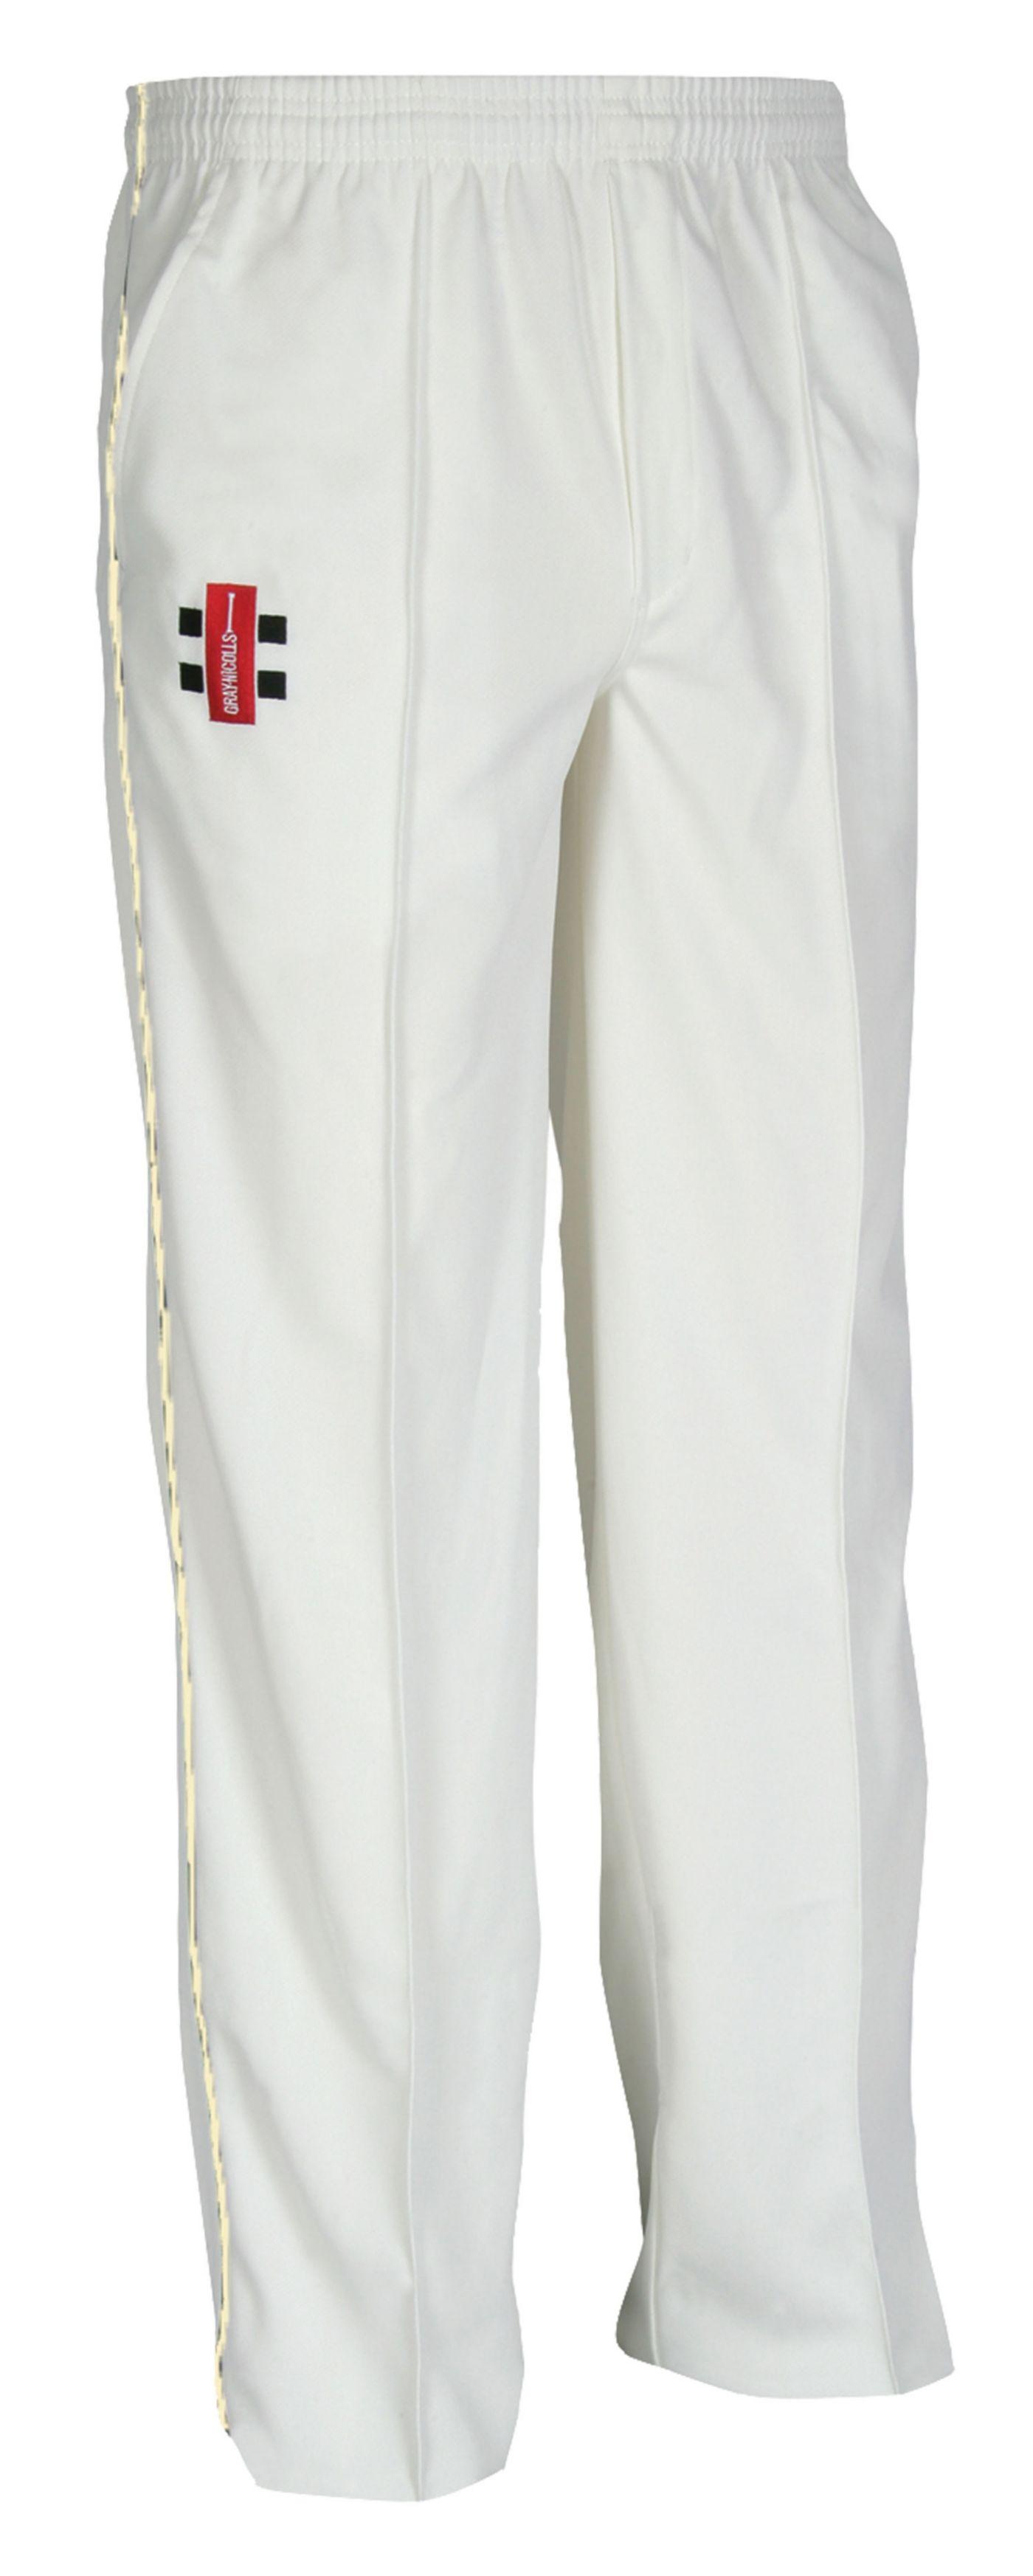 Gray Nicolls Youth Matrix Cricket Pants